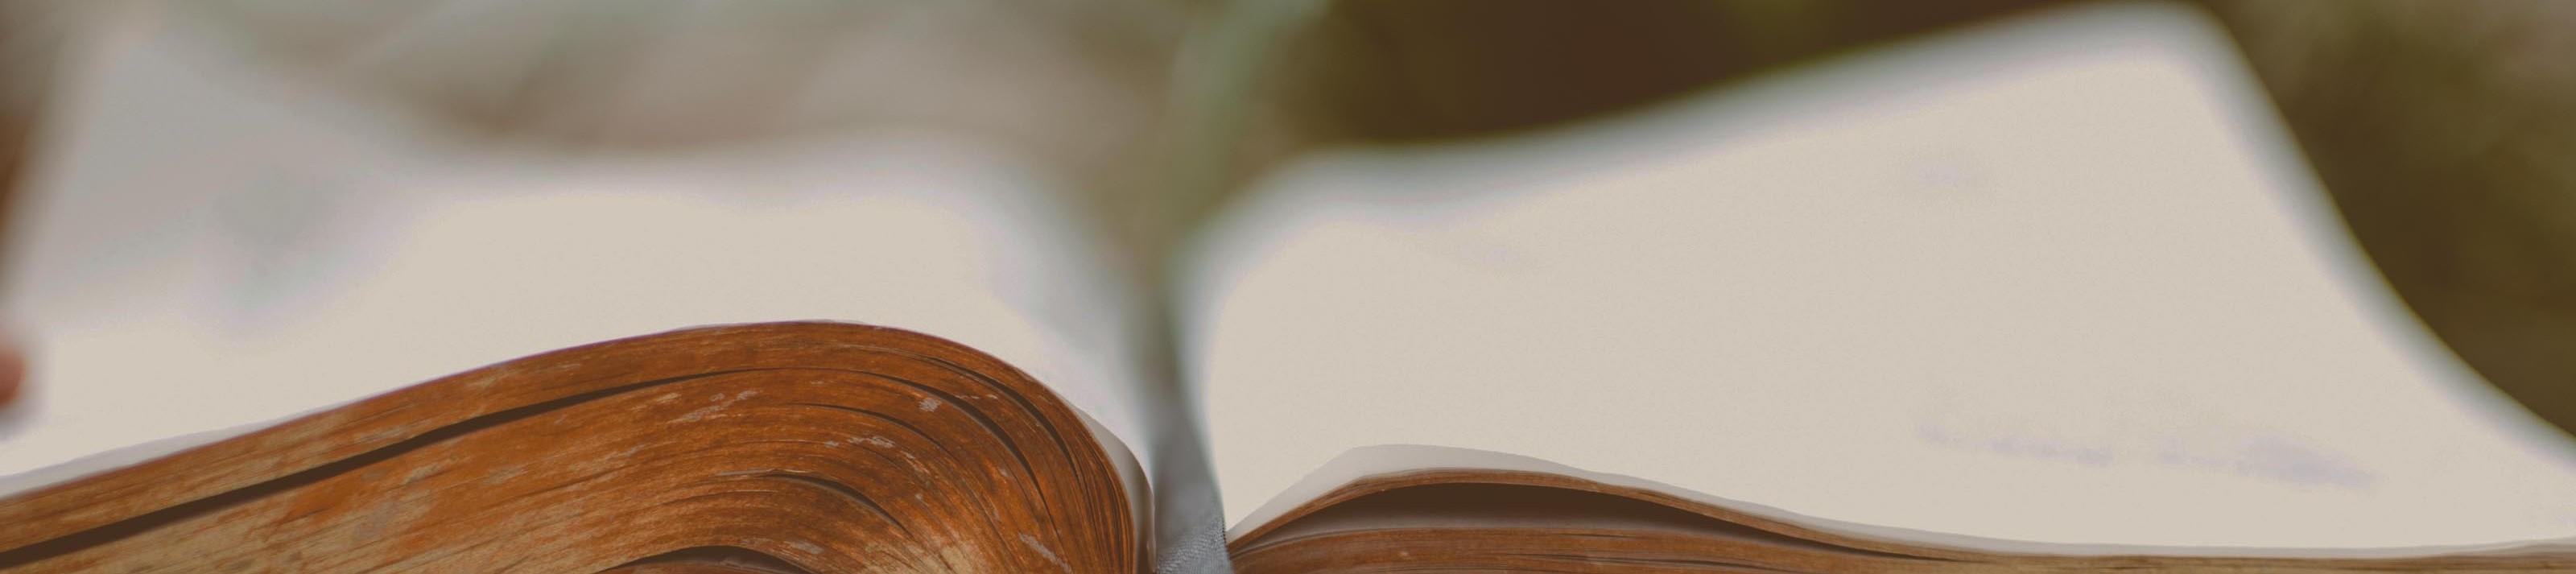 bible headerthin